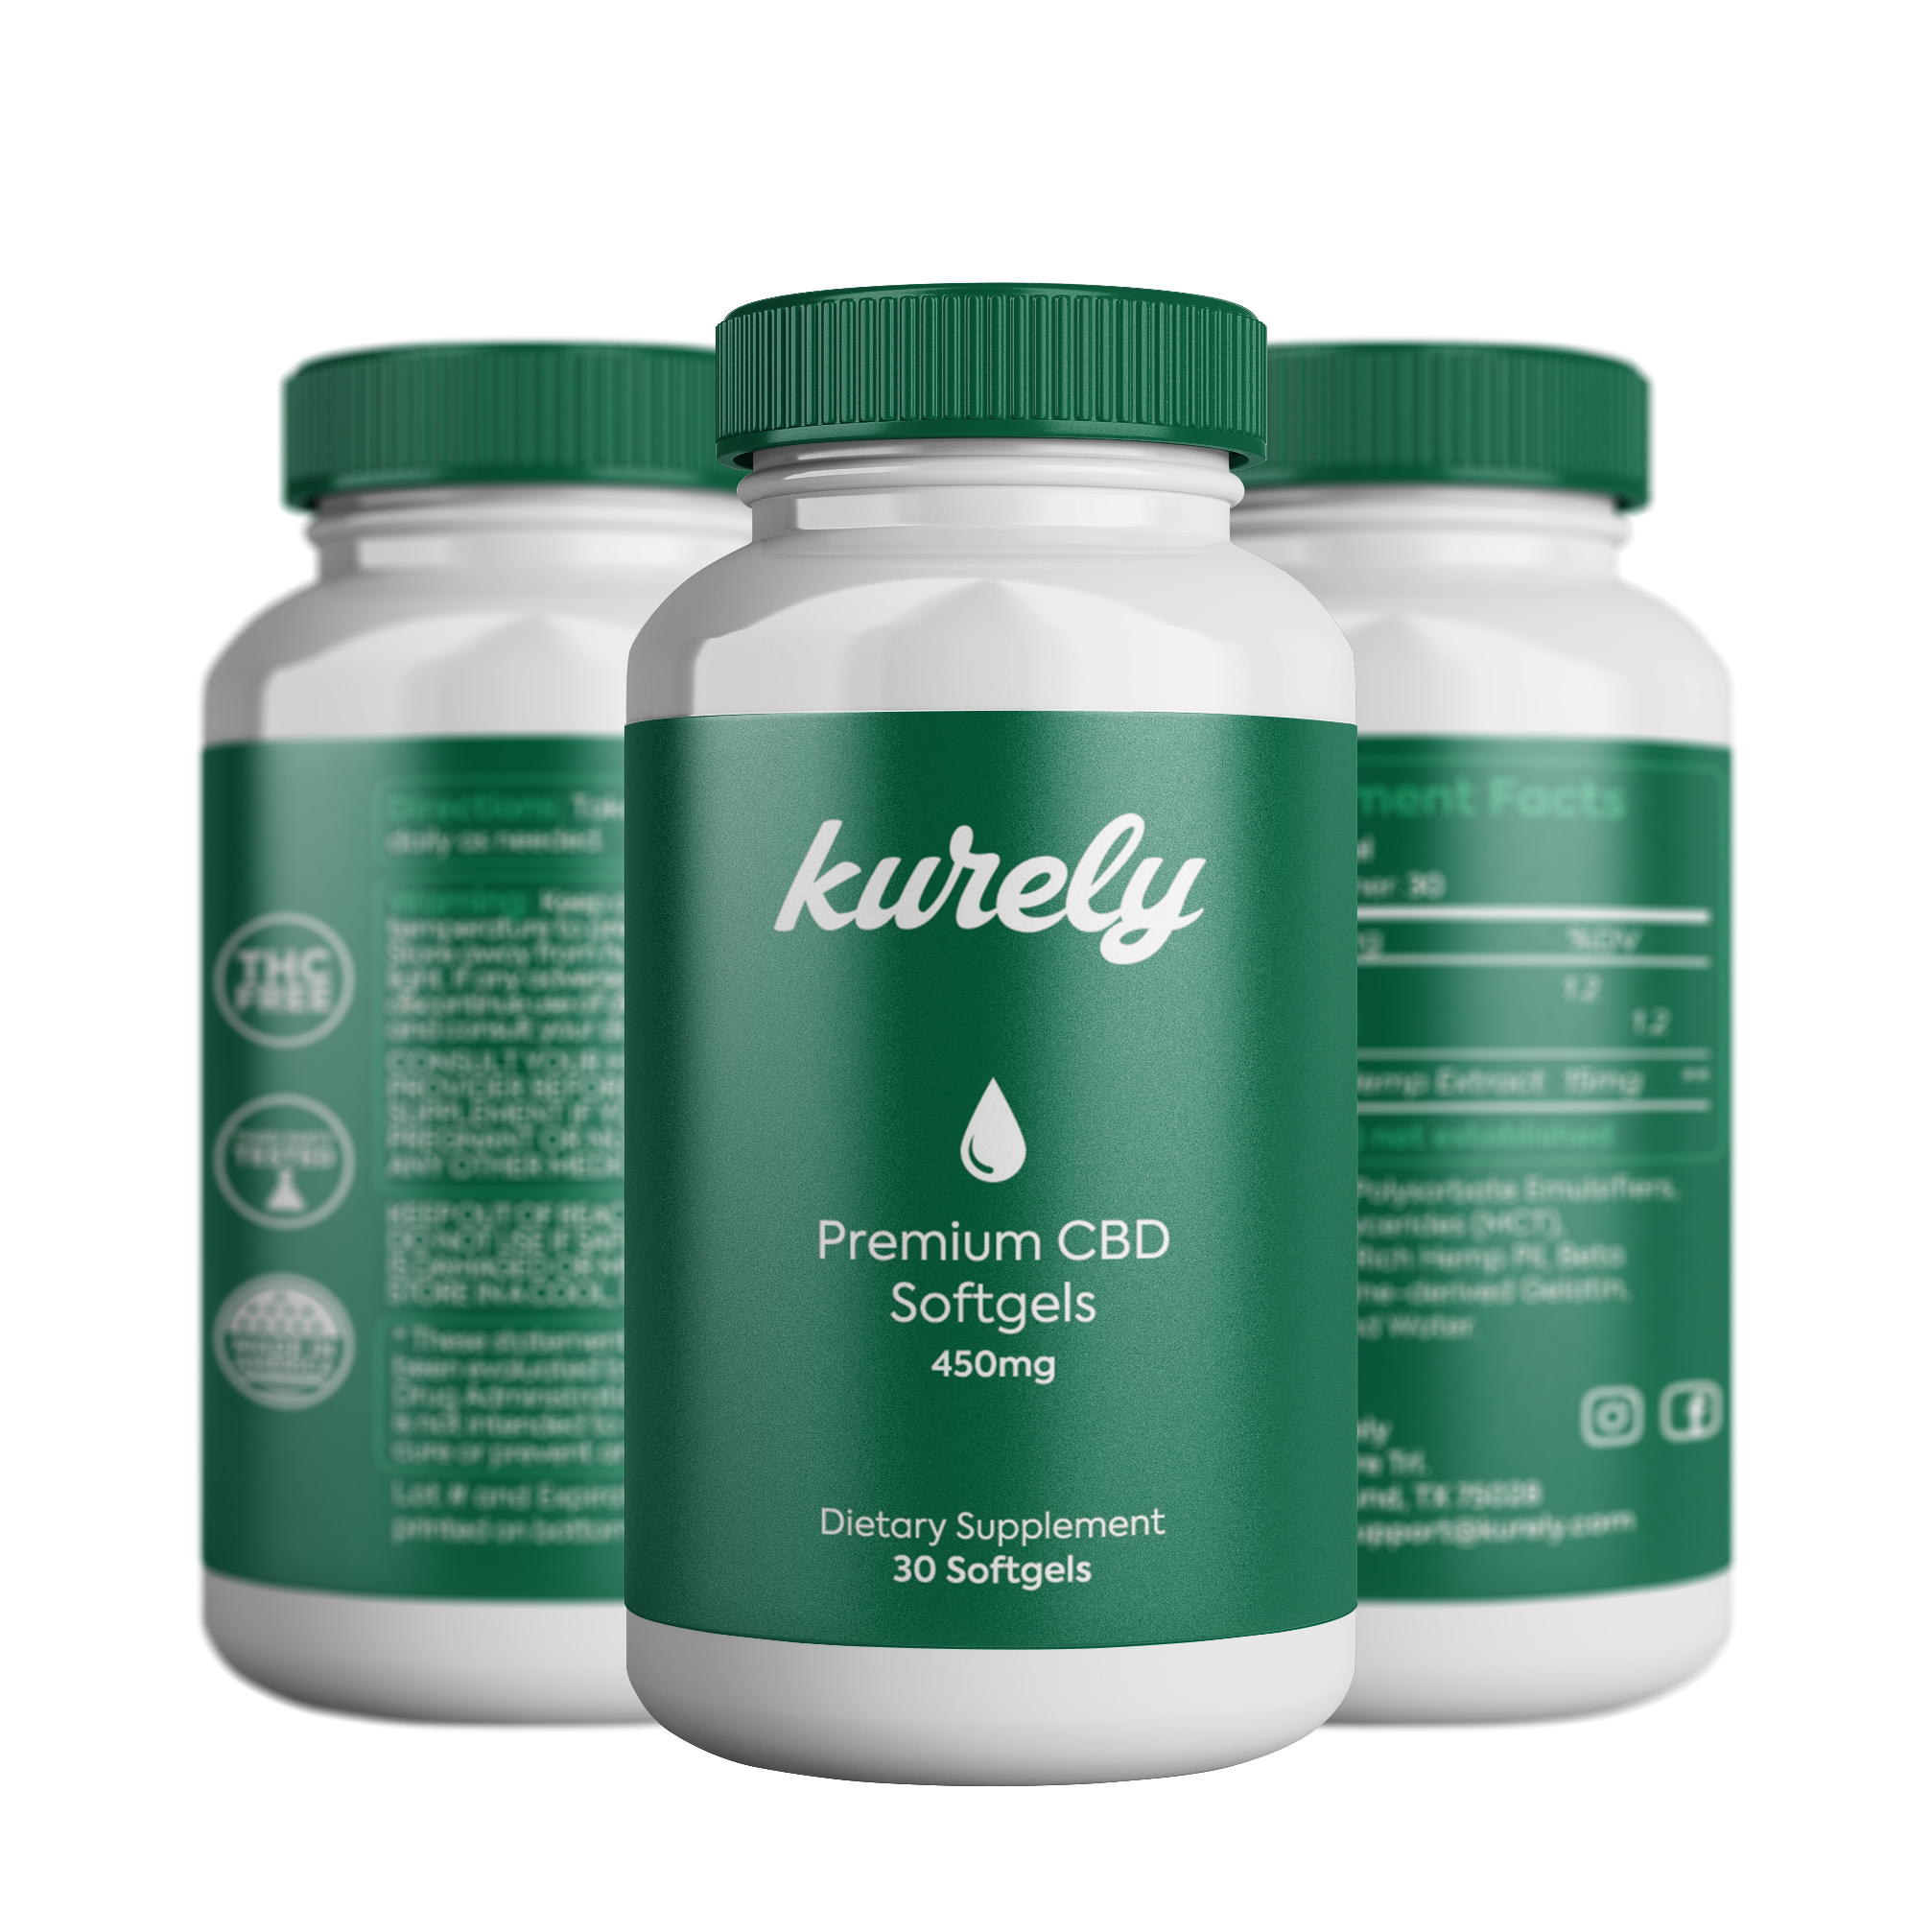 Kurely - CBD oil brand with a purpose.